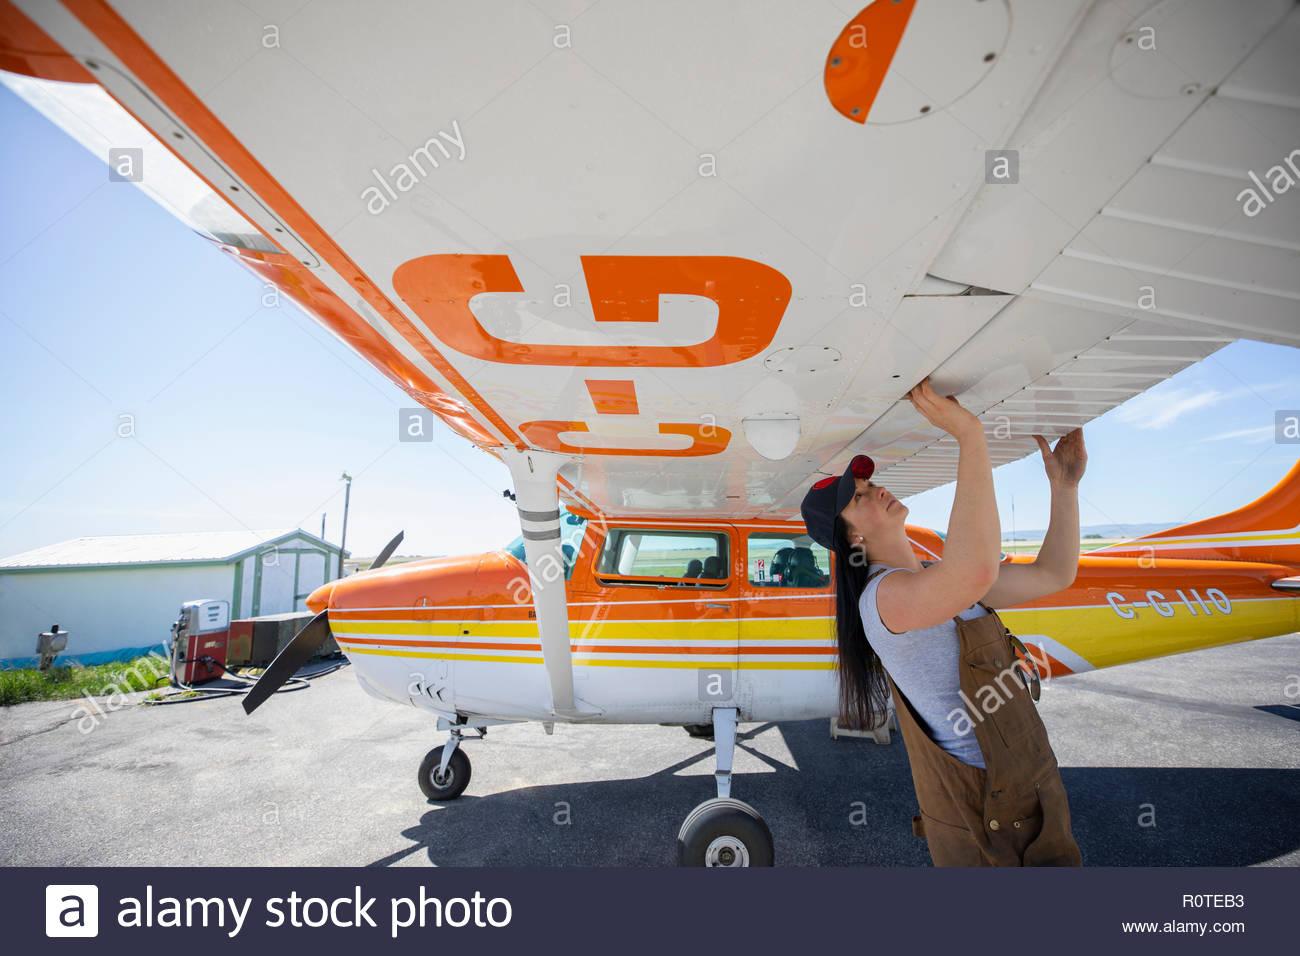 Ingenieurin Kontrolle Flügel des Flügelrads Flugzeug auf Asphalt Stockbild